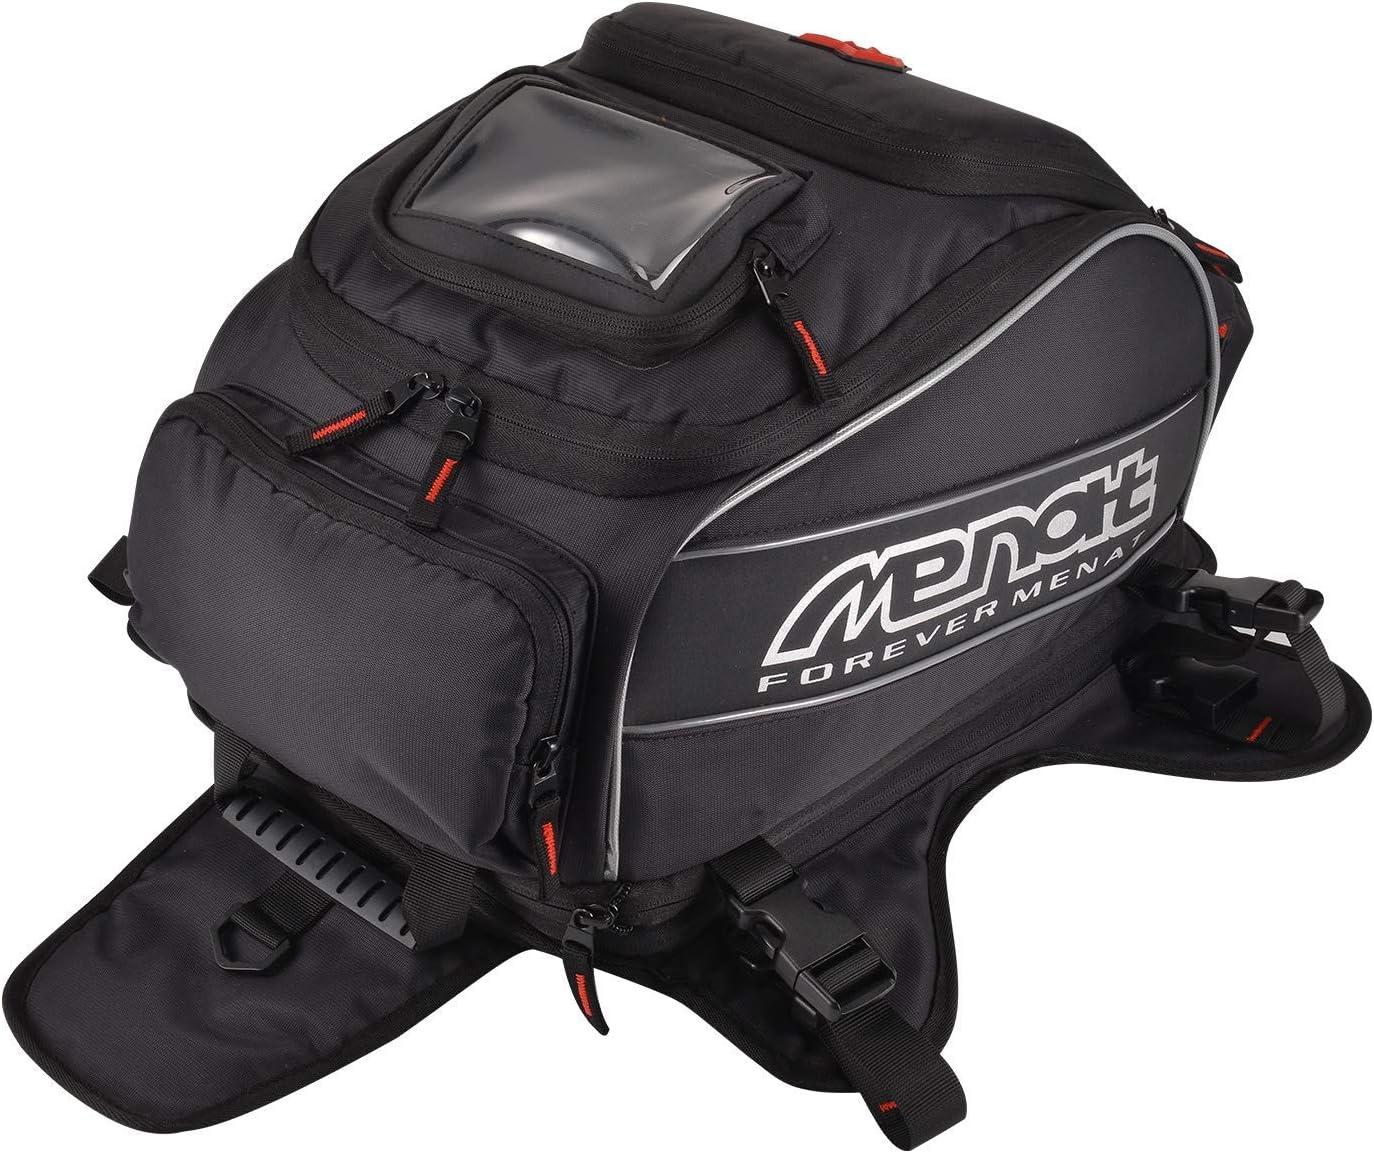 WILDKEN Motorcycle Tank Bag Waterproof Foldable Motorcycle Bag with 2 Windows 23L Removable Base Backpack with Strong Magnet Rain Cover and Straps for Honda Yamaha Suzuki Kawasaki Harley